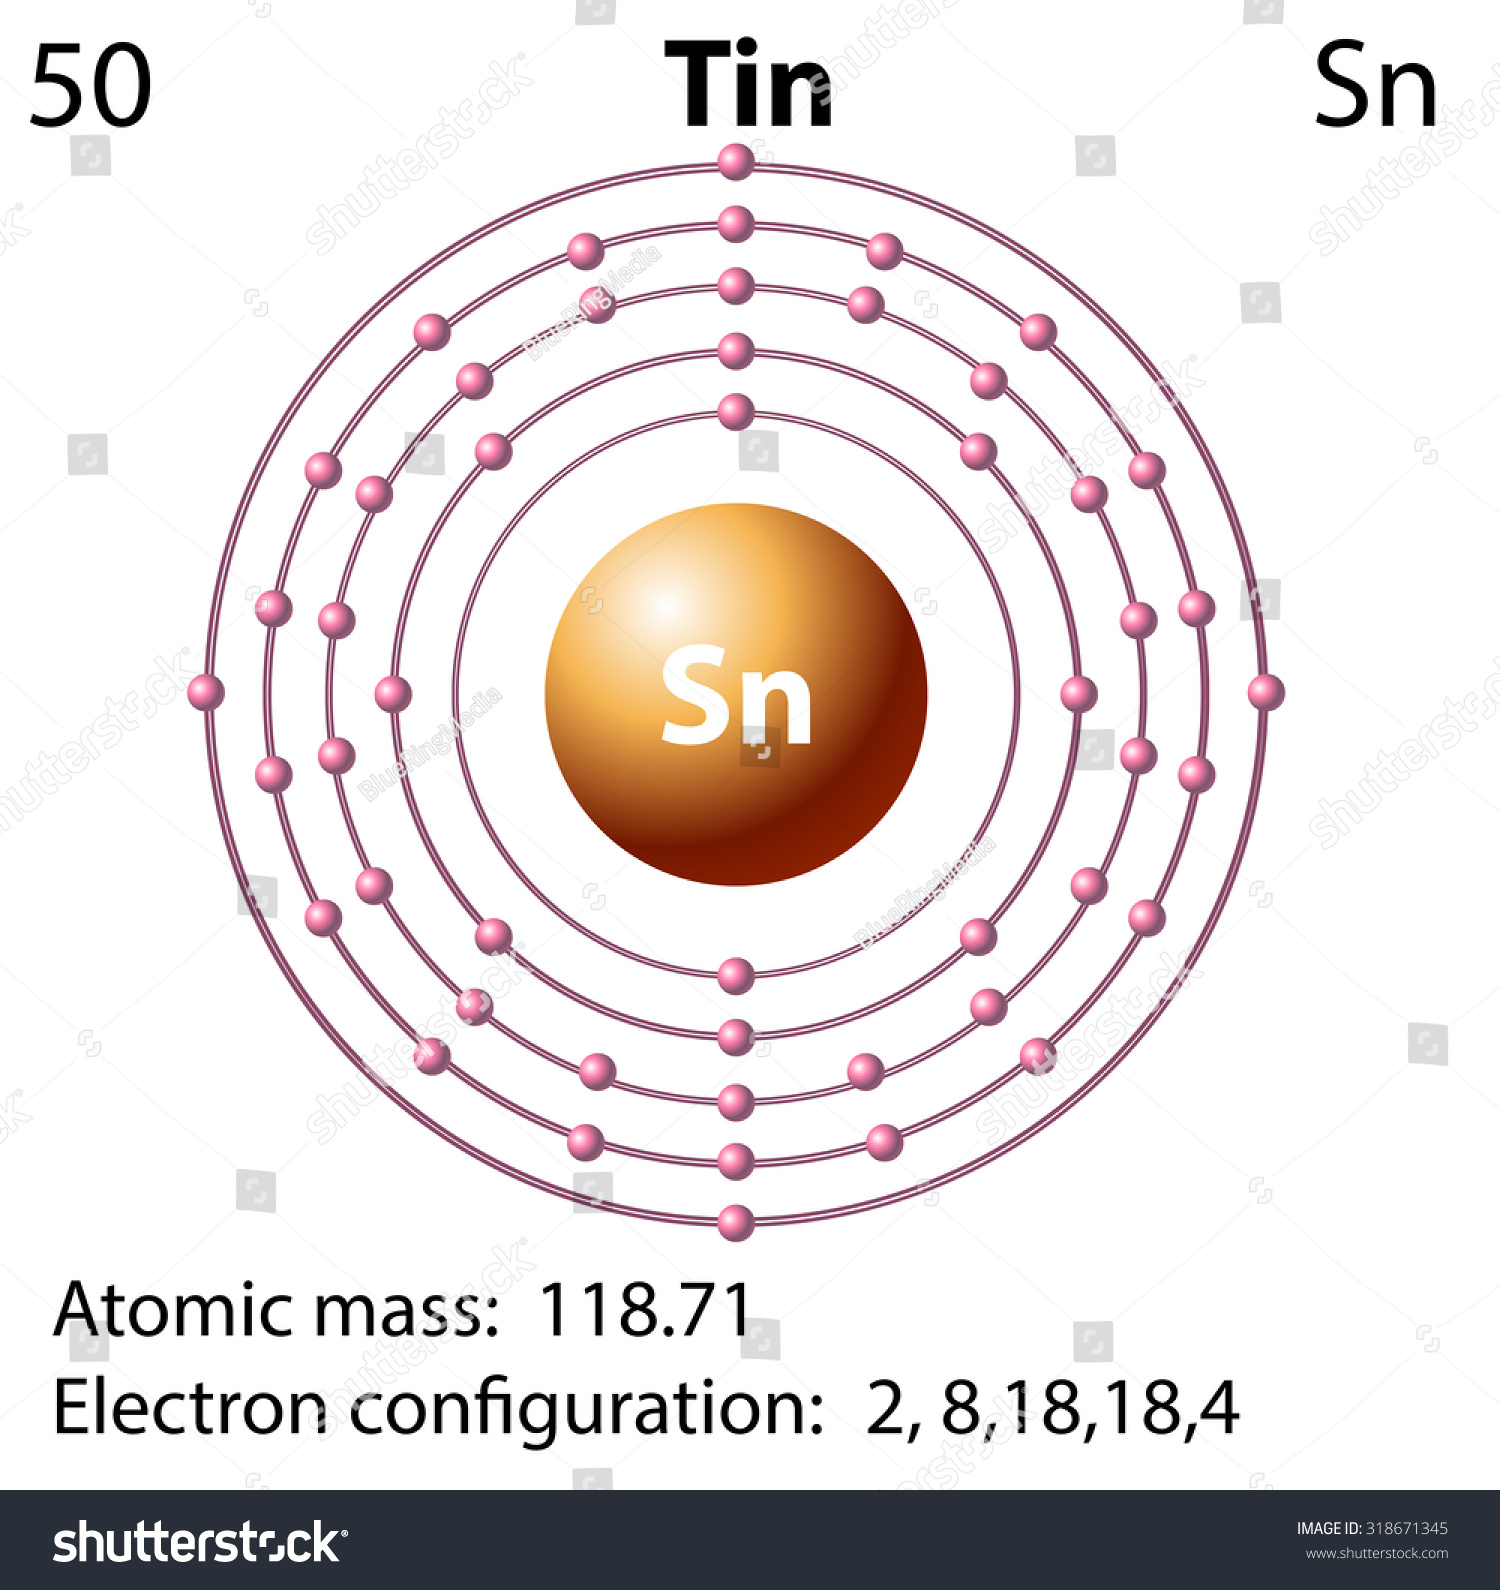 Symbol electron diagram tin illustration stock vector 318671345 symbol electron diagram tin illustration stock vector 318671345 shutterstock pooptronica